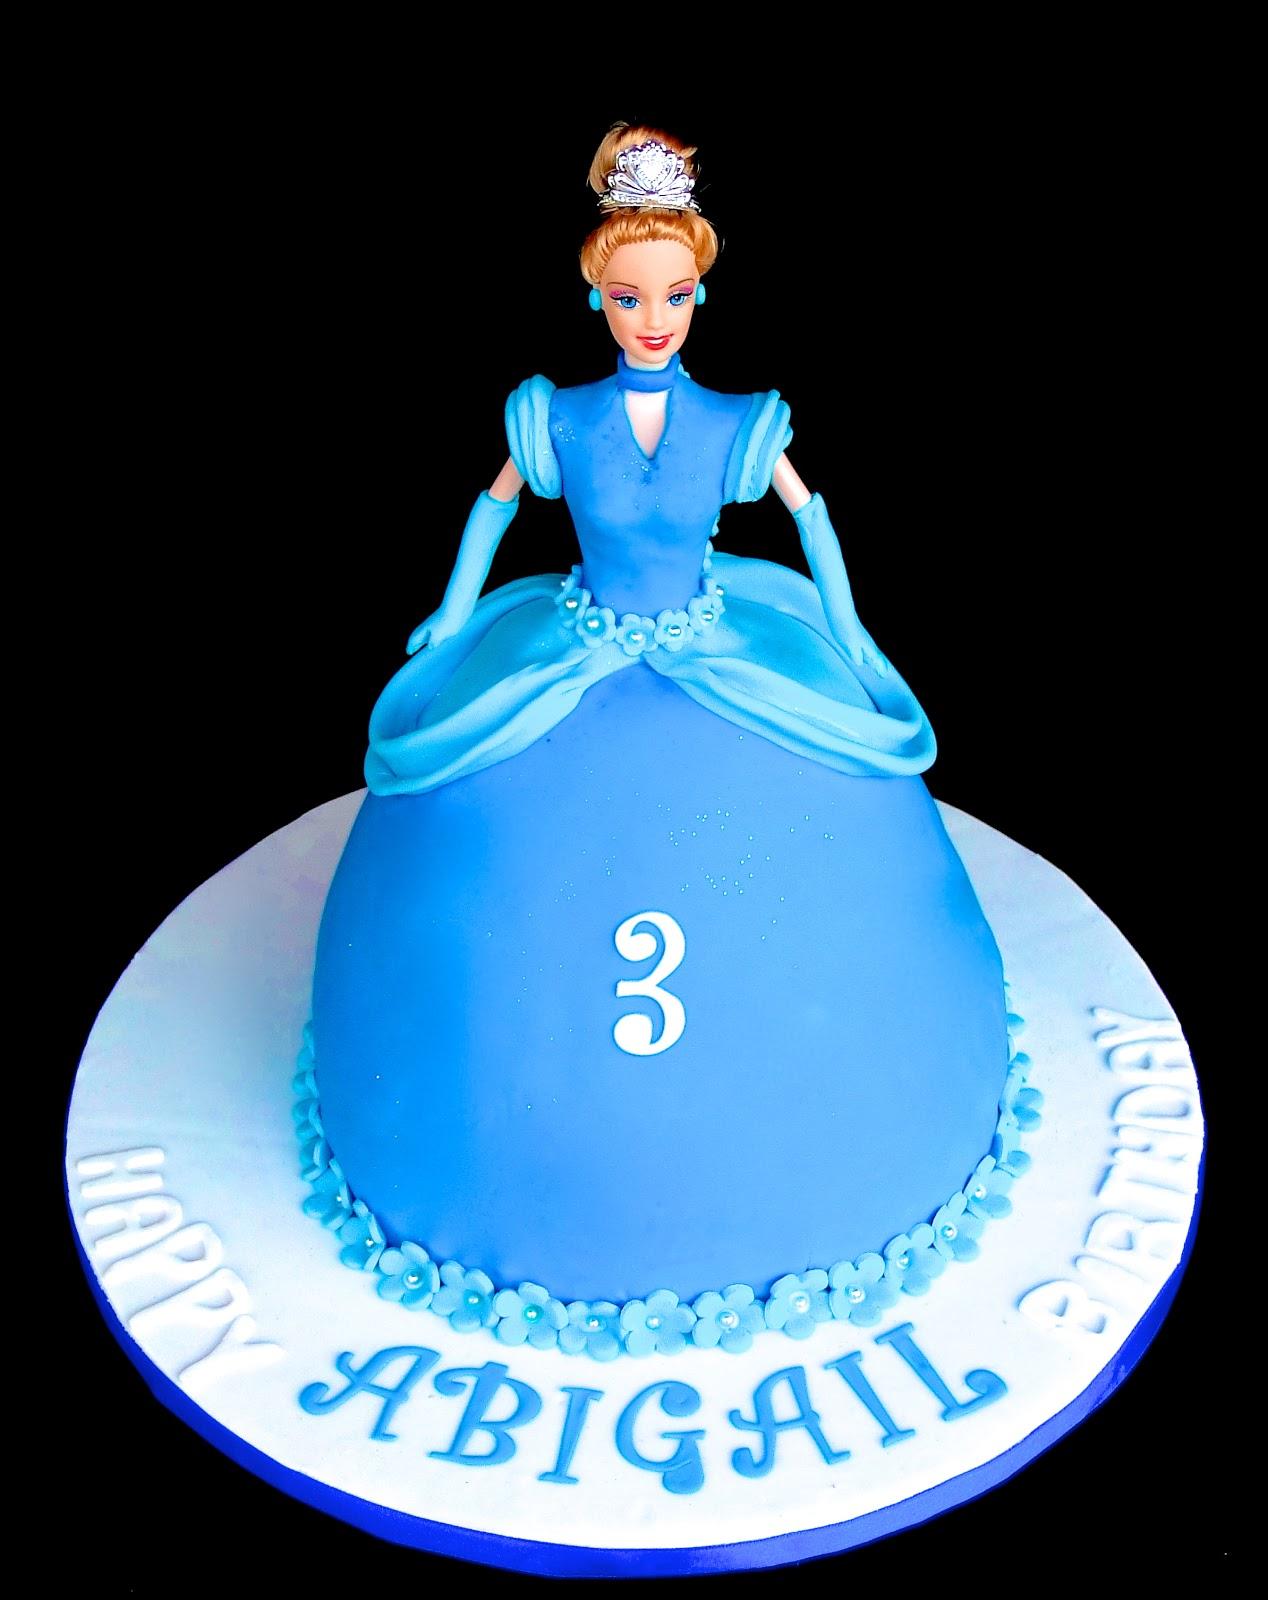 Tremendous Cinderella Cakes Decoration Ideas Little Birthday Cakes Funny Birthday Cards Online Inifofree Goldxyz